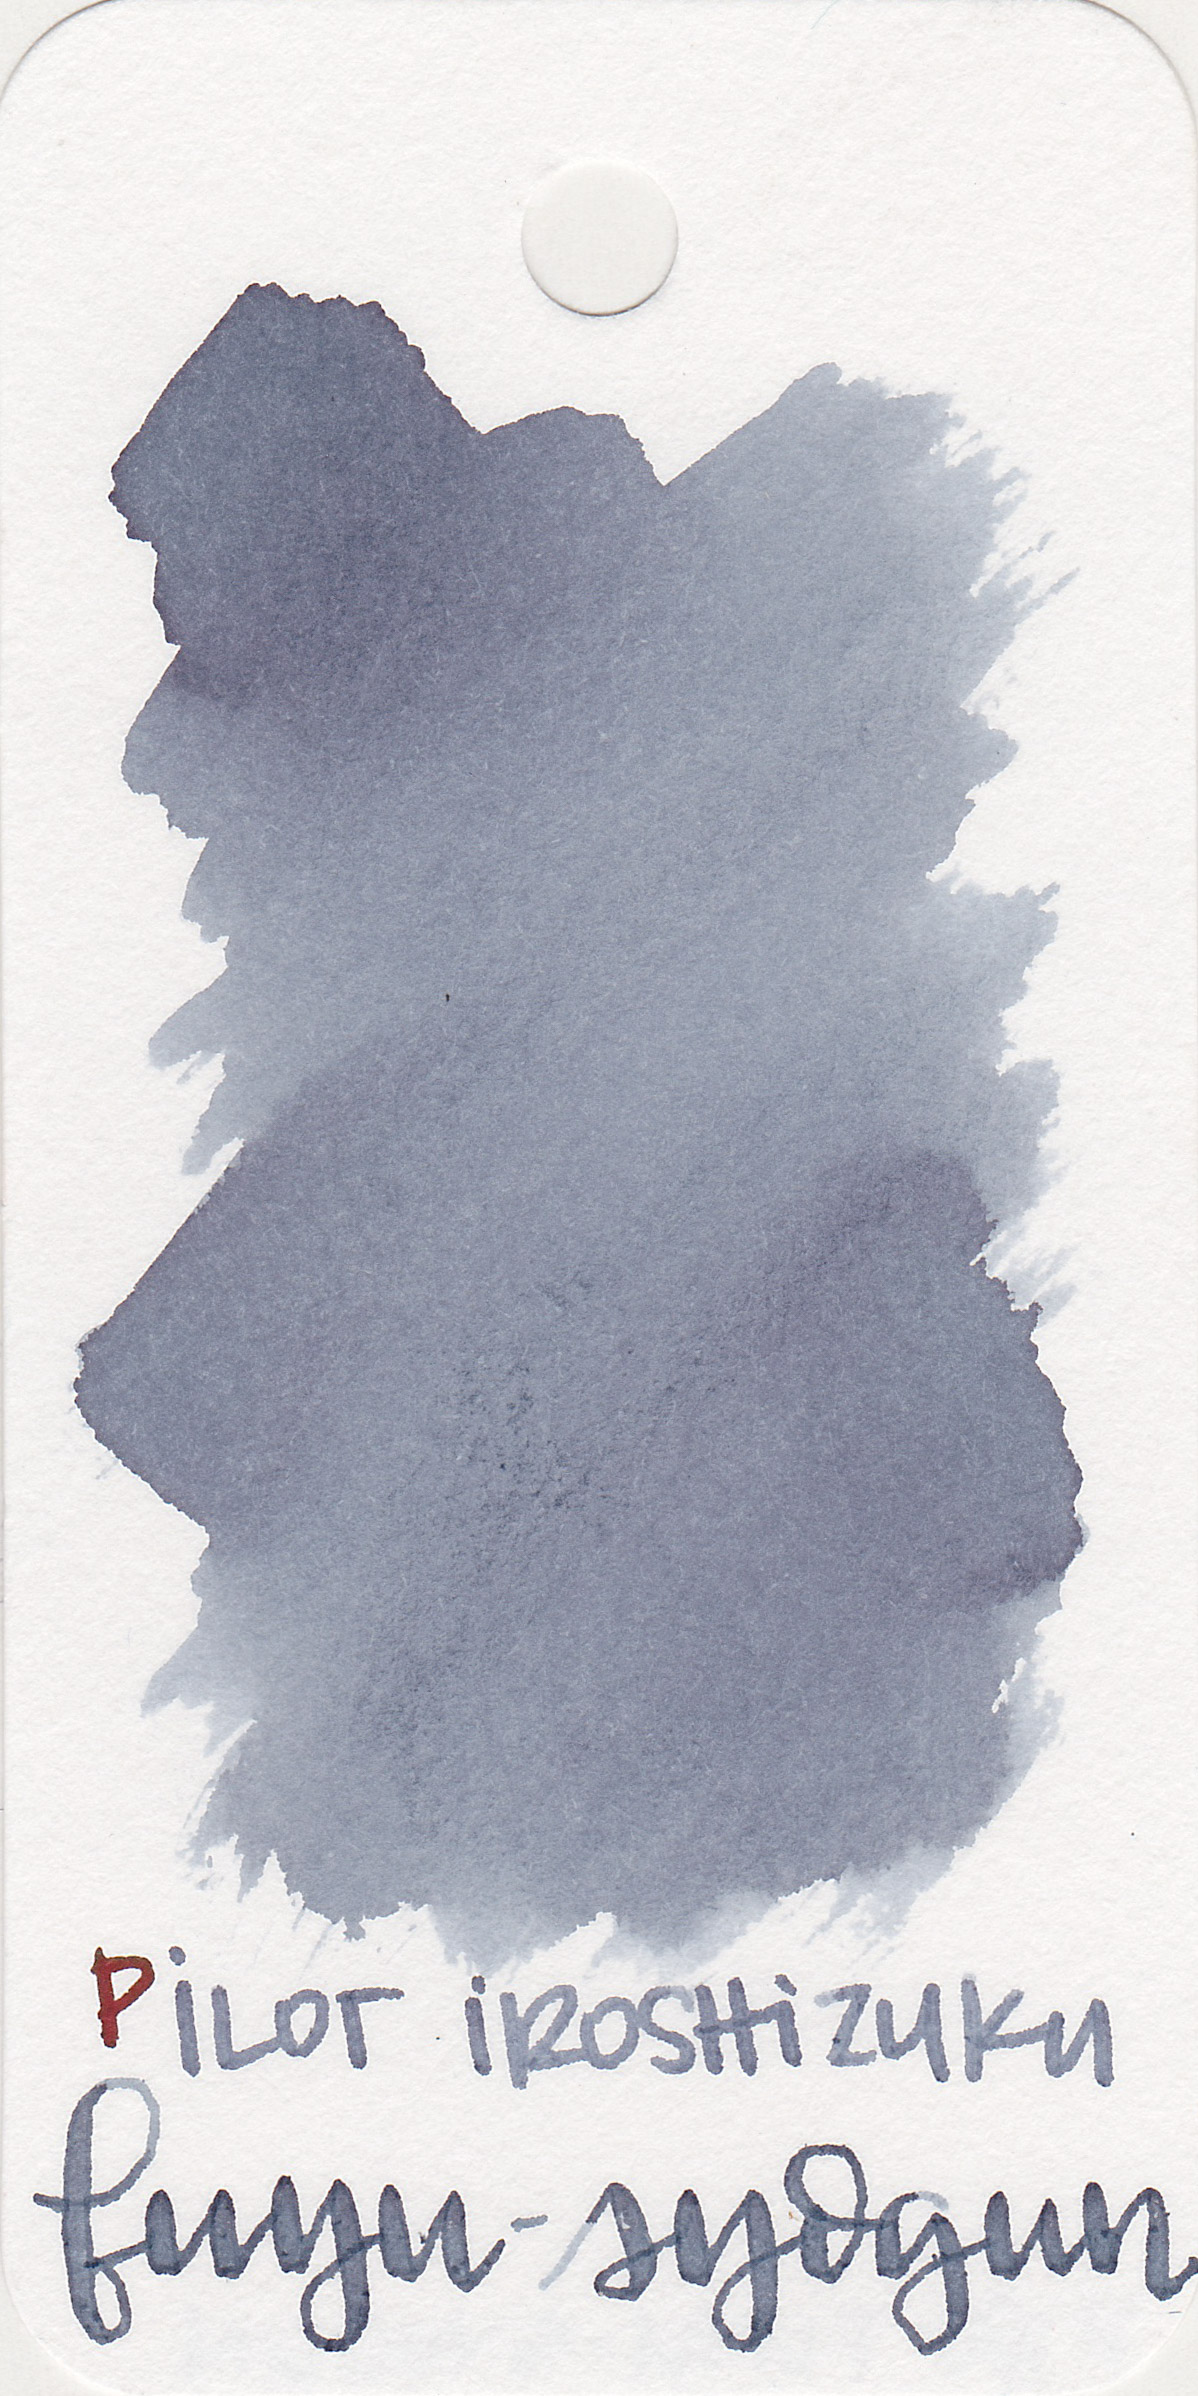 The color: - Fuyu-syogun is a medium grey with a purple undertone.